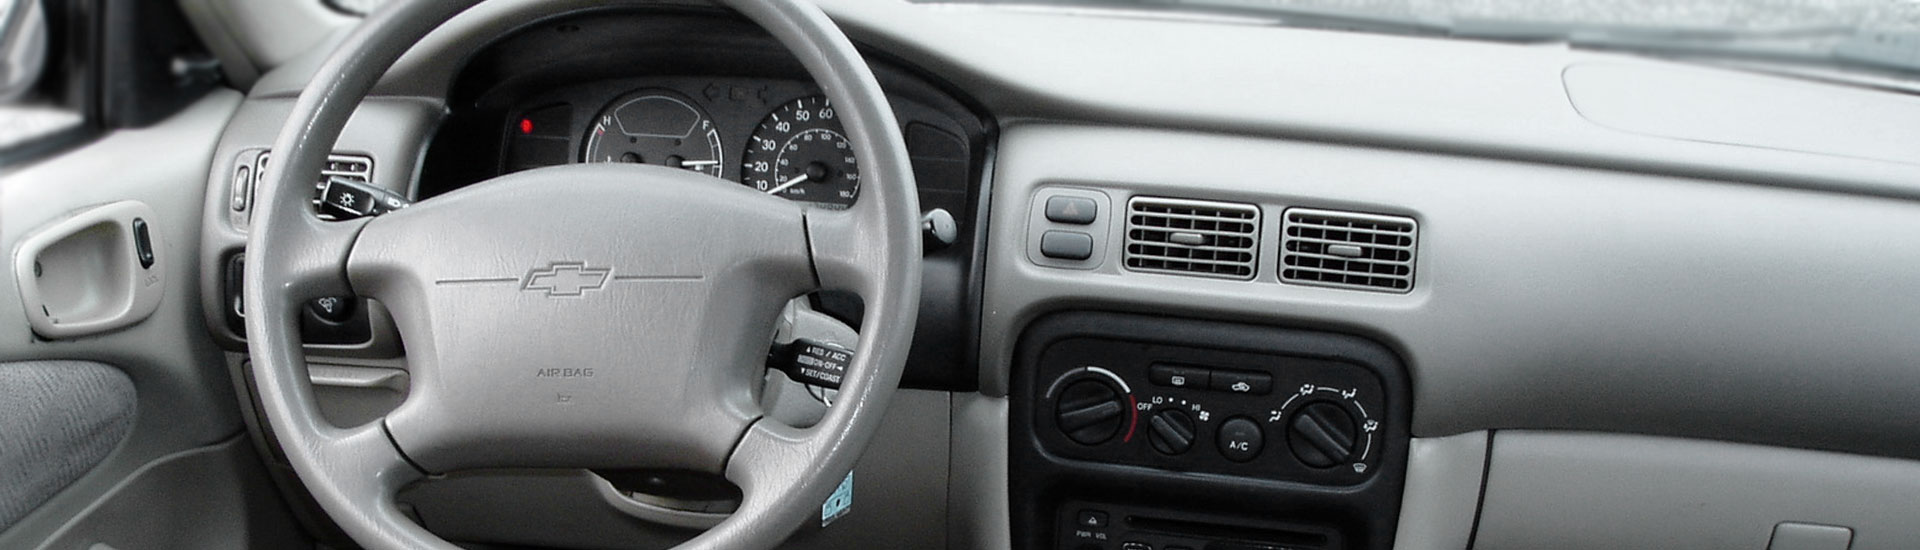 hight resolution of geo prizm custom dash kits